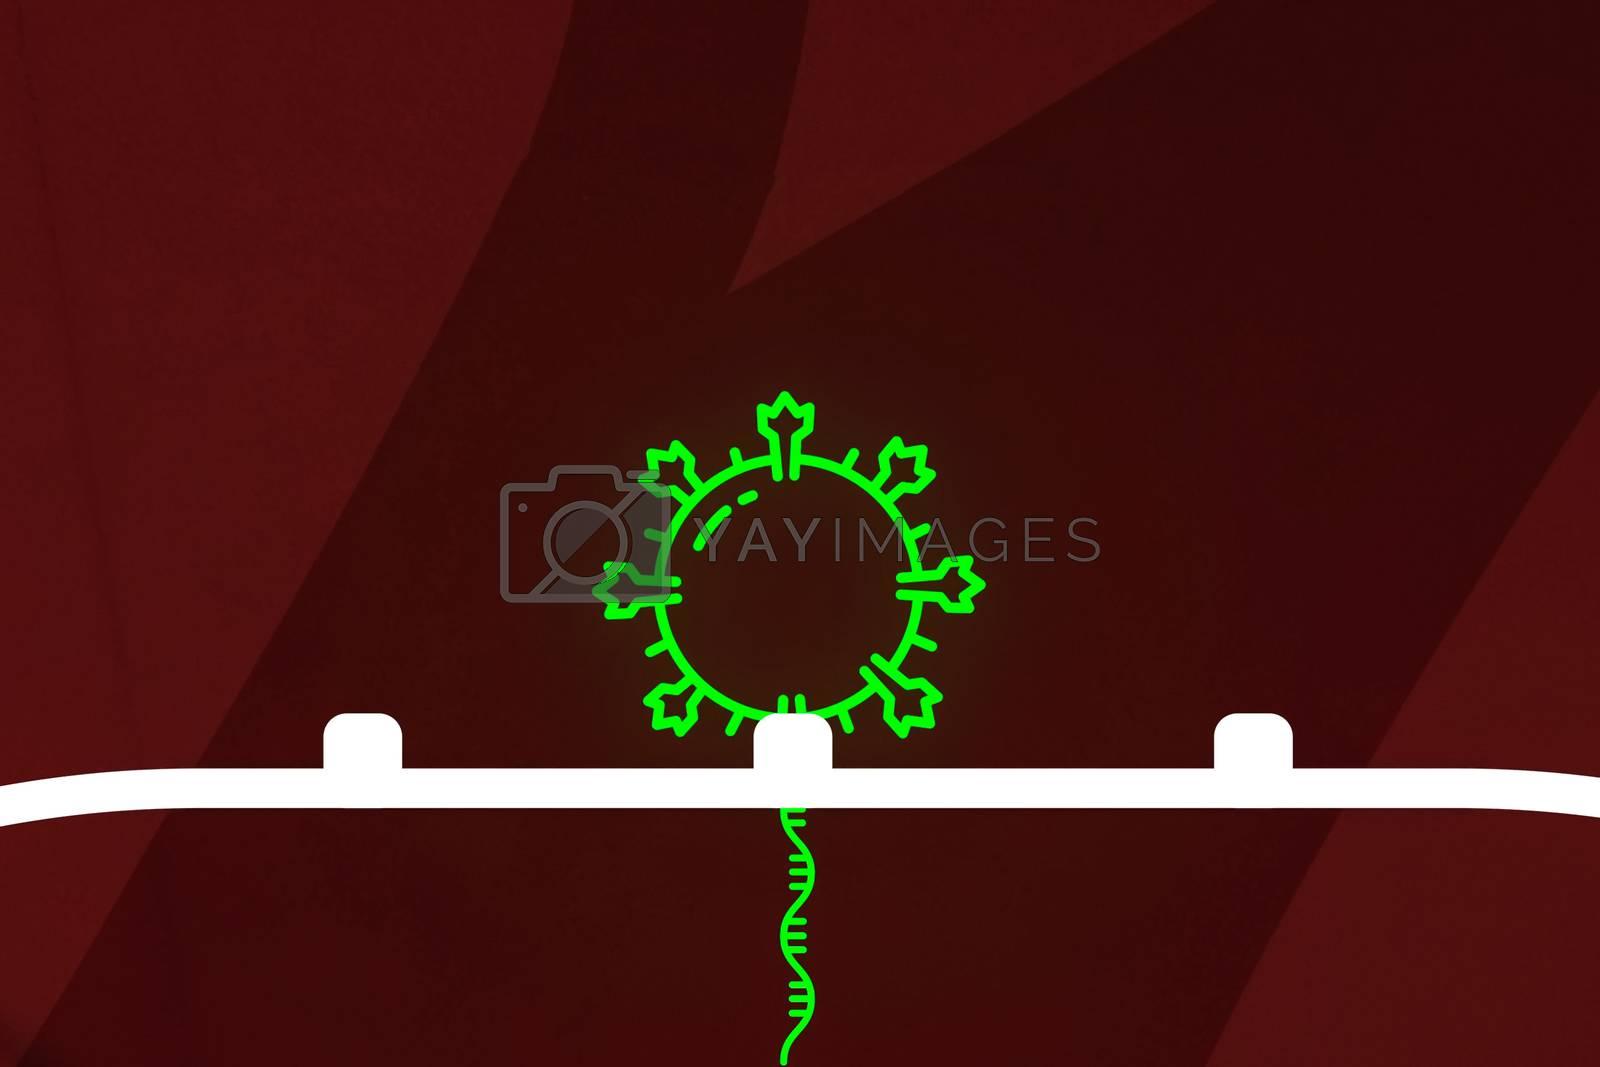 An image of the virus. Drawing a coronavirus illustration.